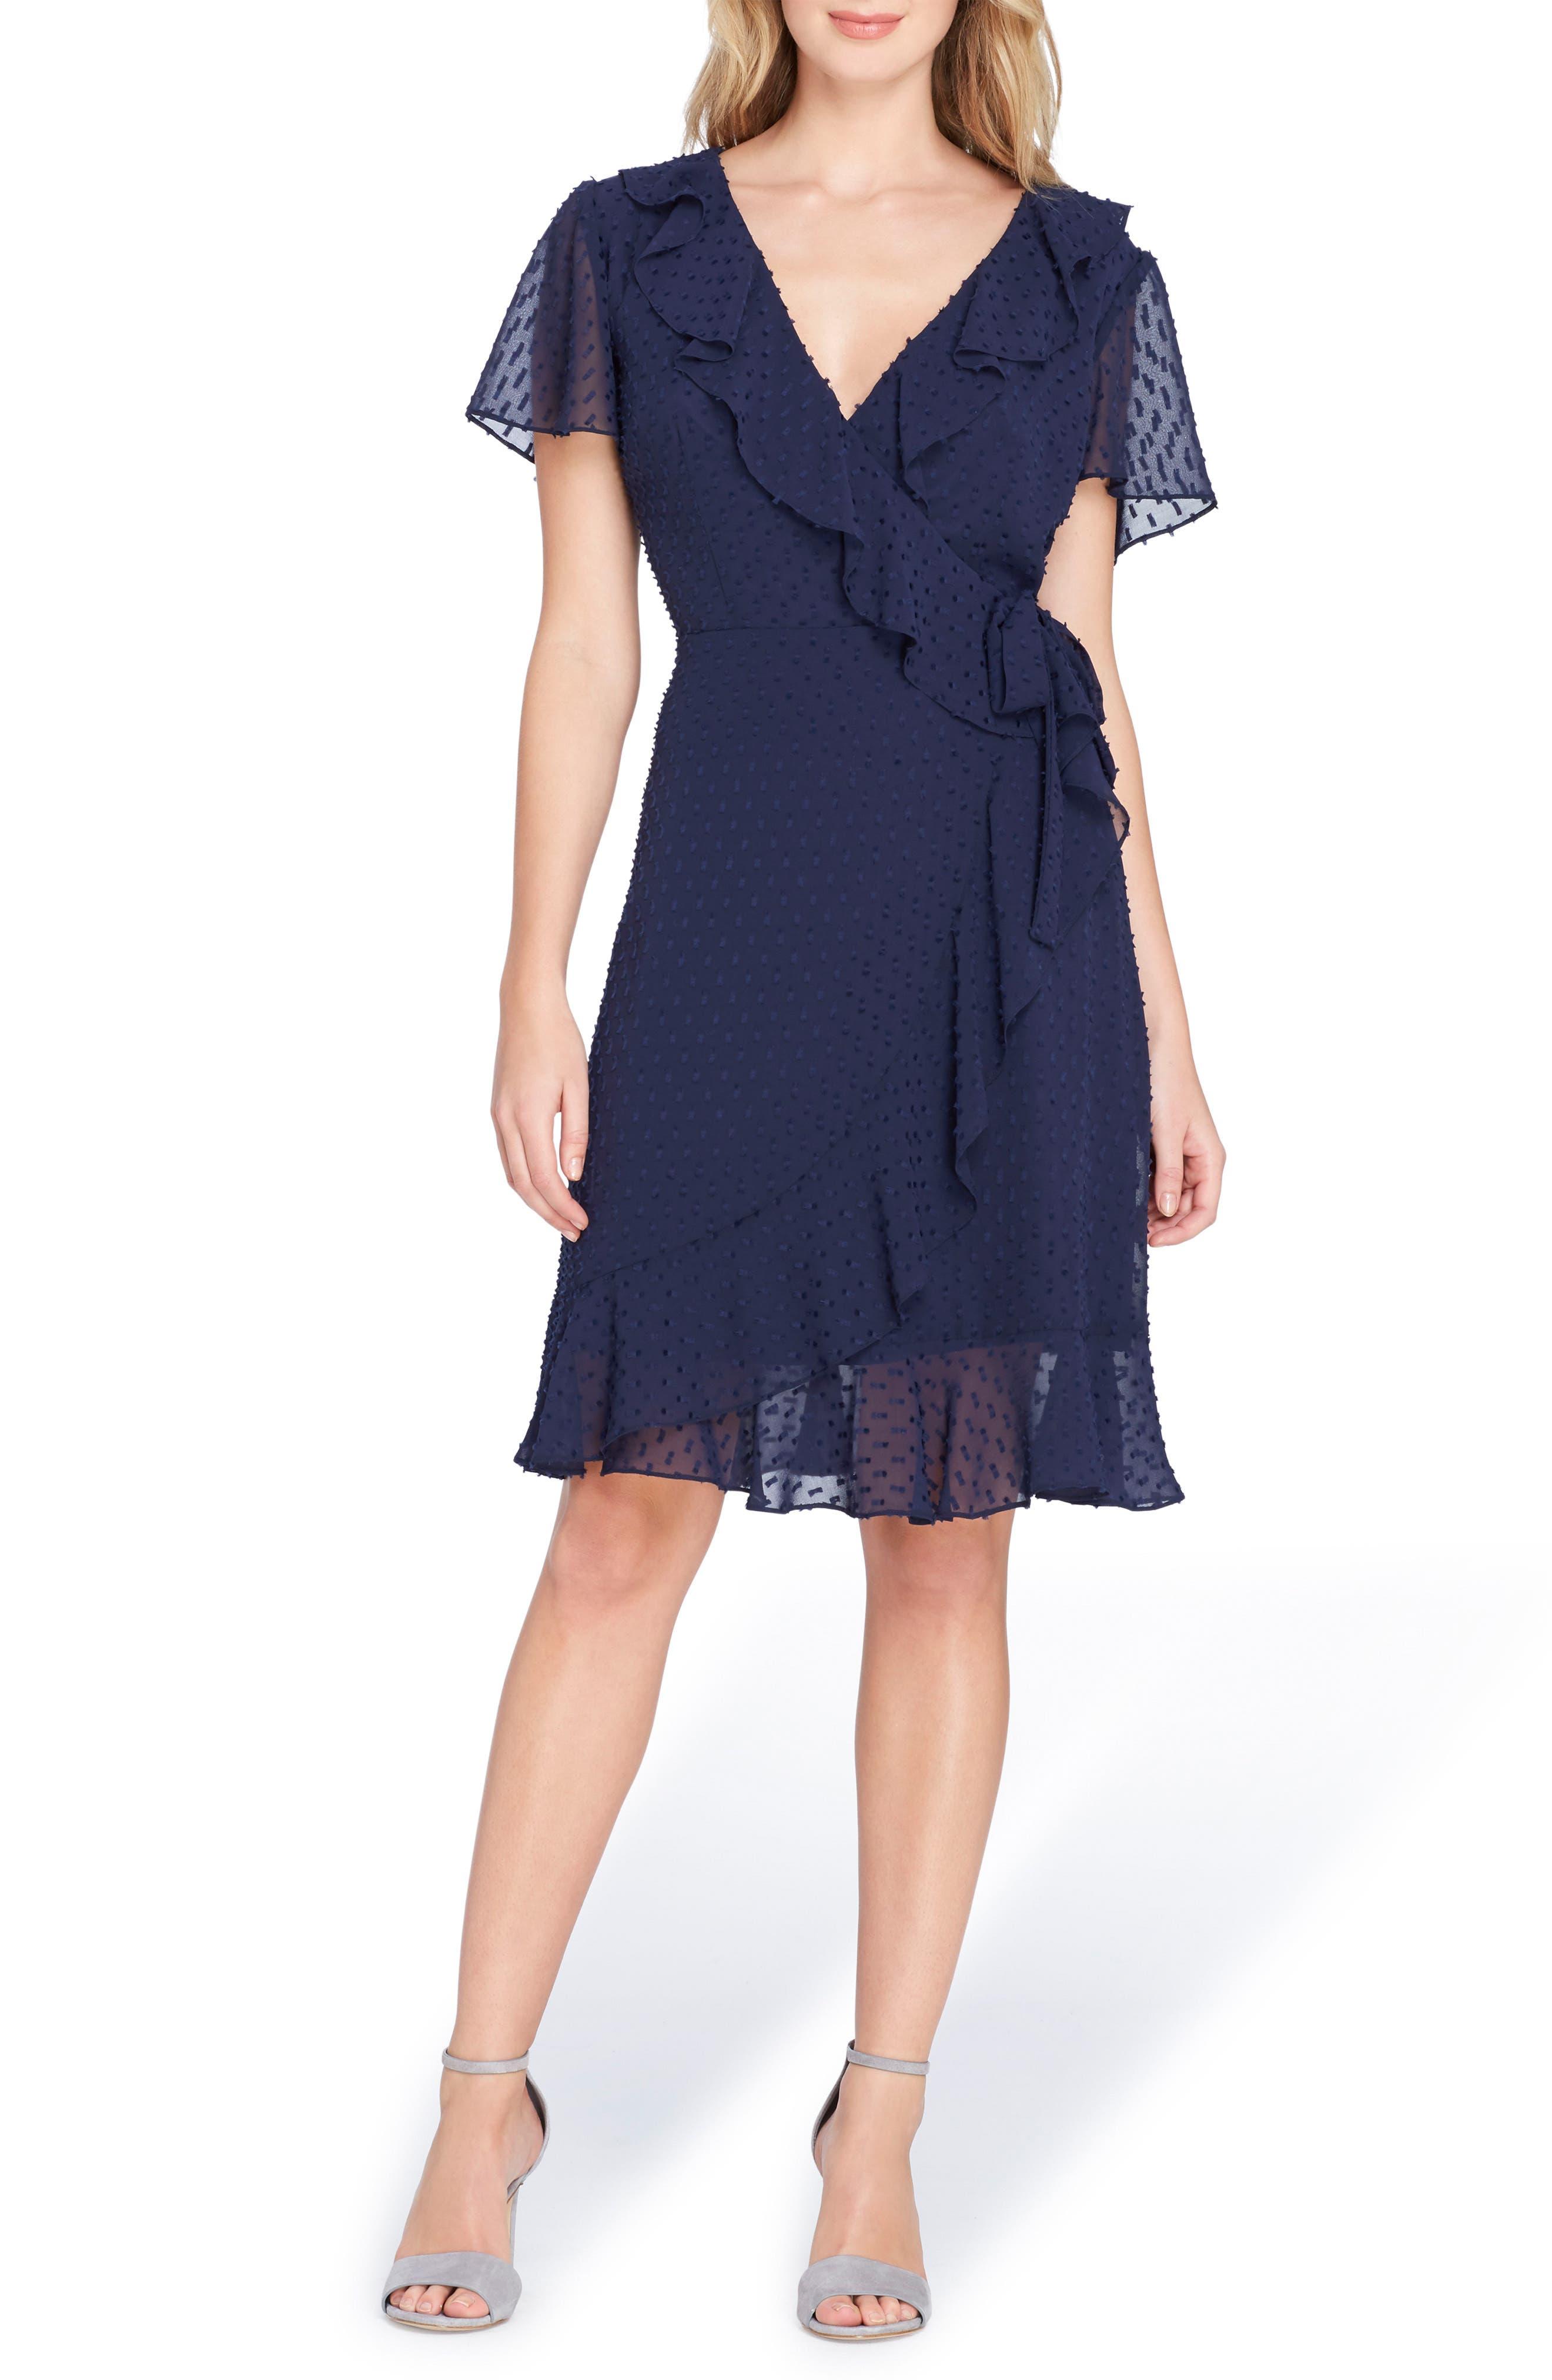 Swiss Dot Chiffon Dress,                         Main,                         color, Navy